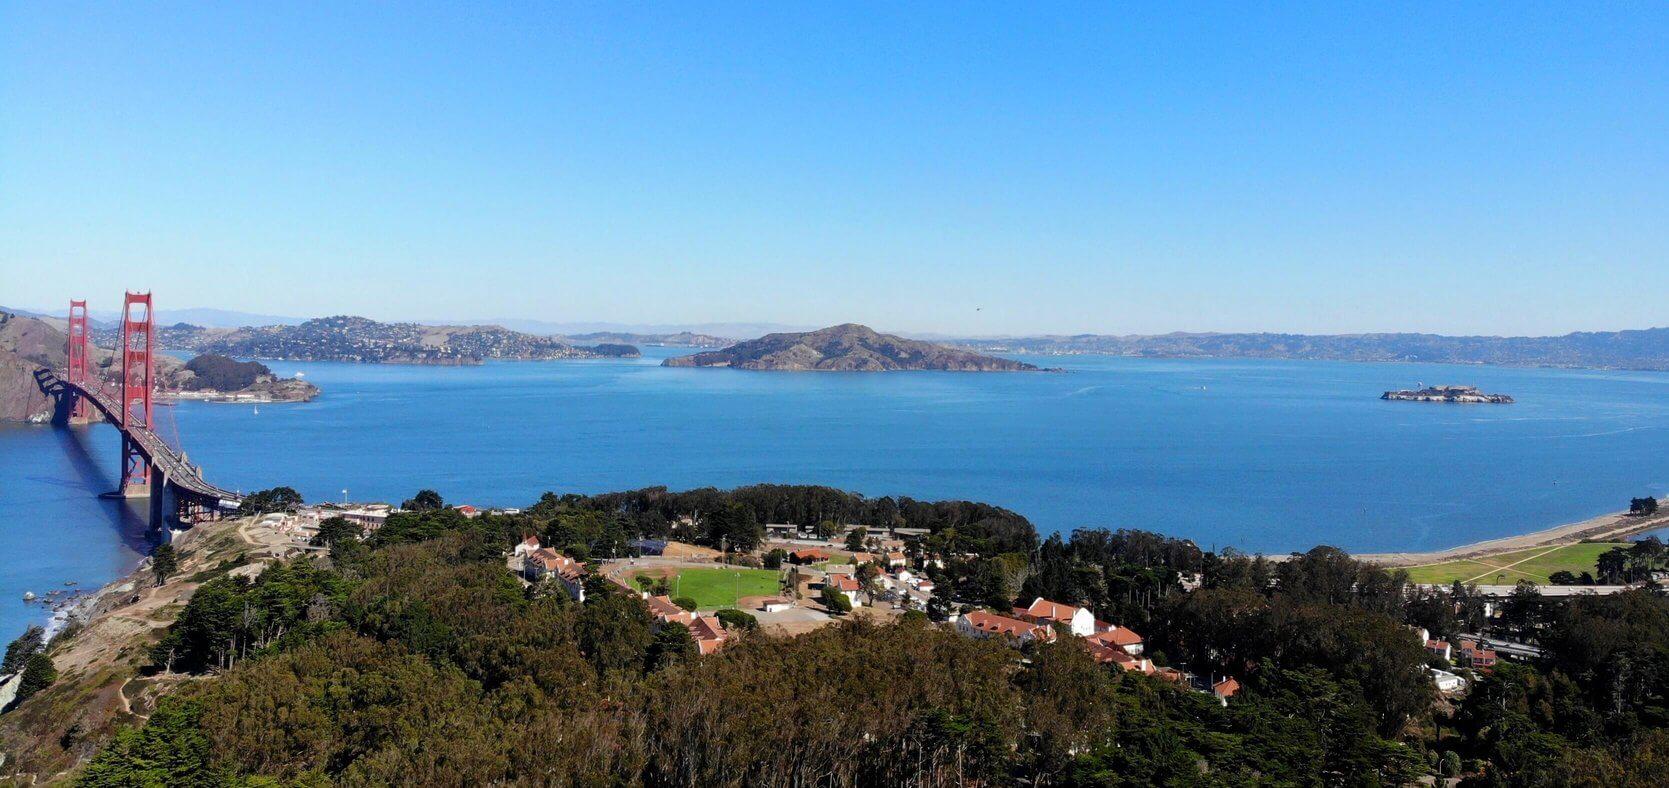 aerial_photography_of_san_francisco_bay_area_golden_gate_bridge_views